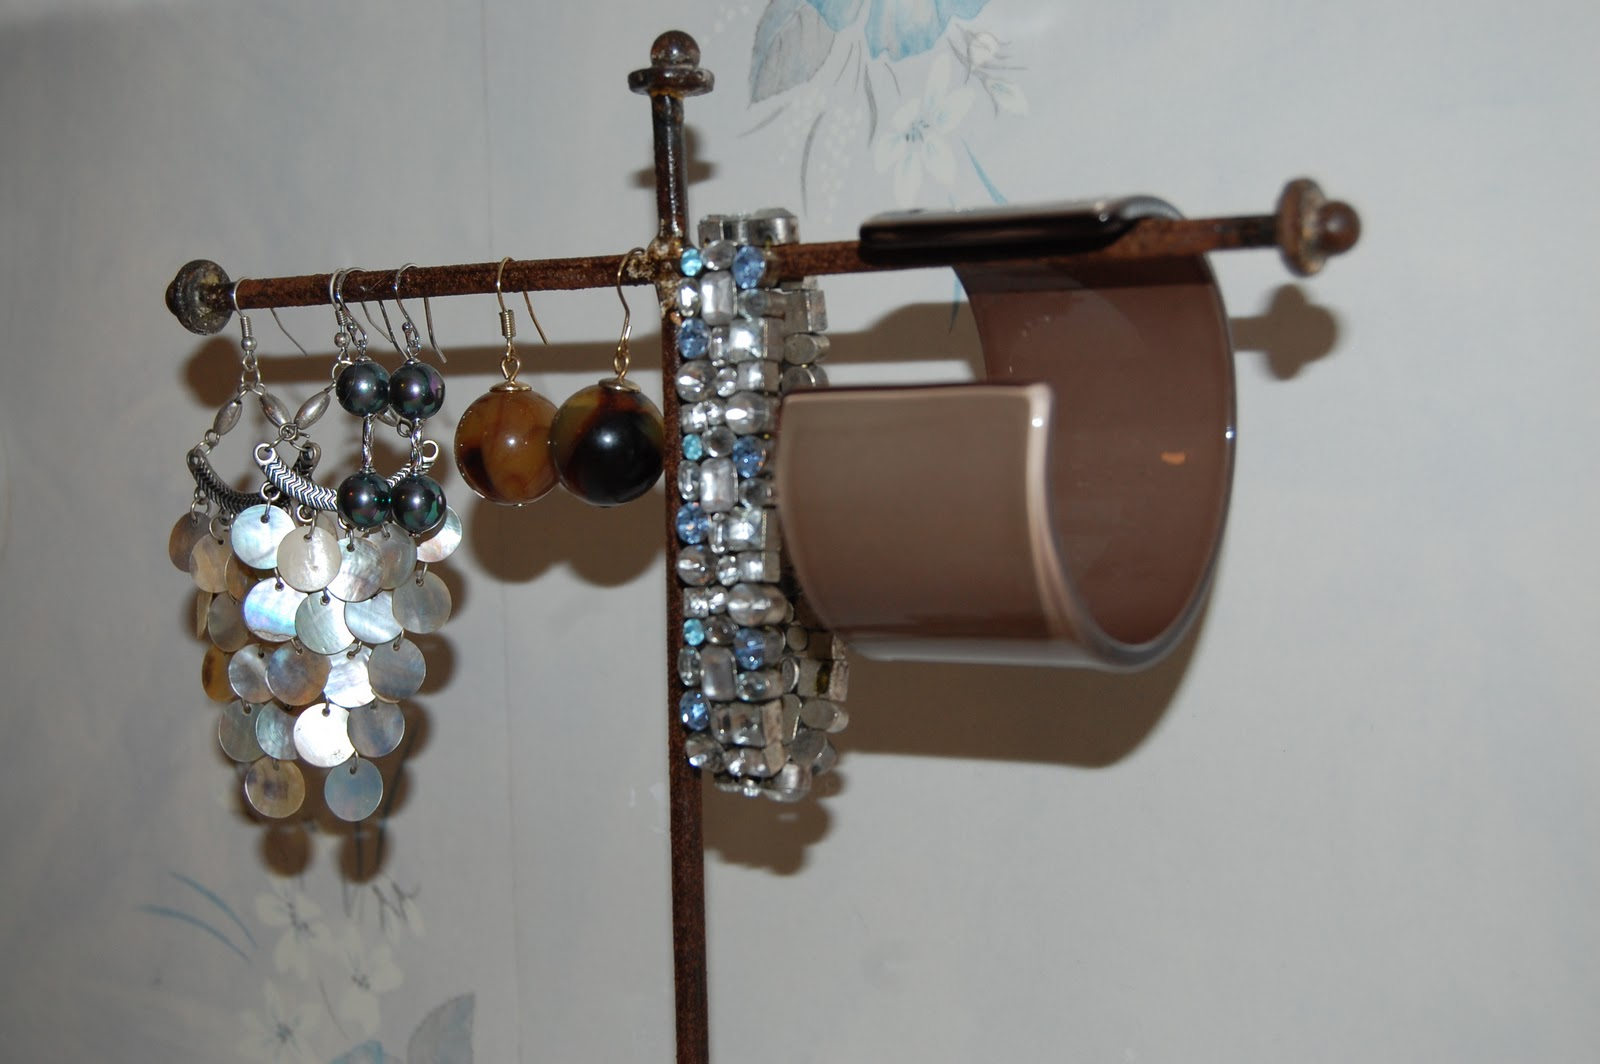 Camillas romantiske hjem : Baderom make-over